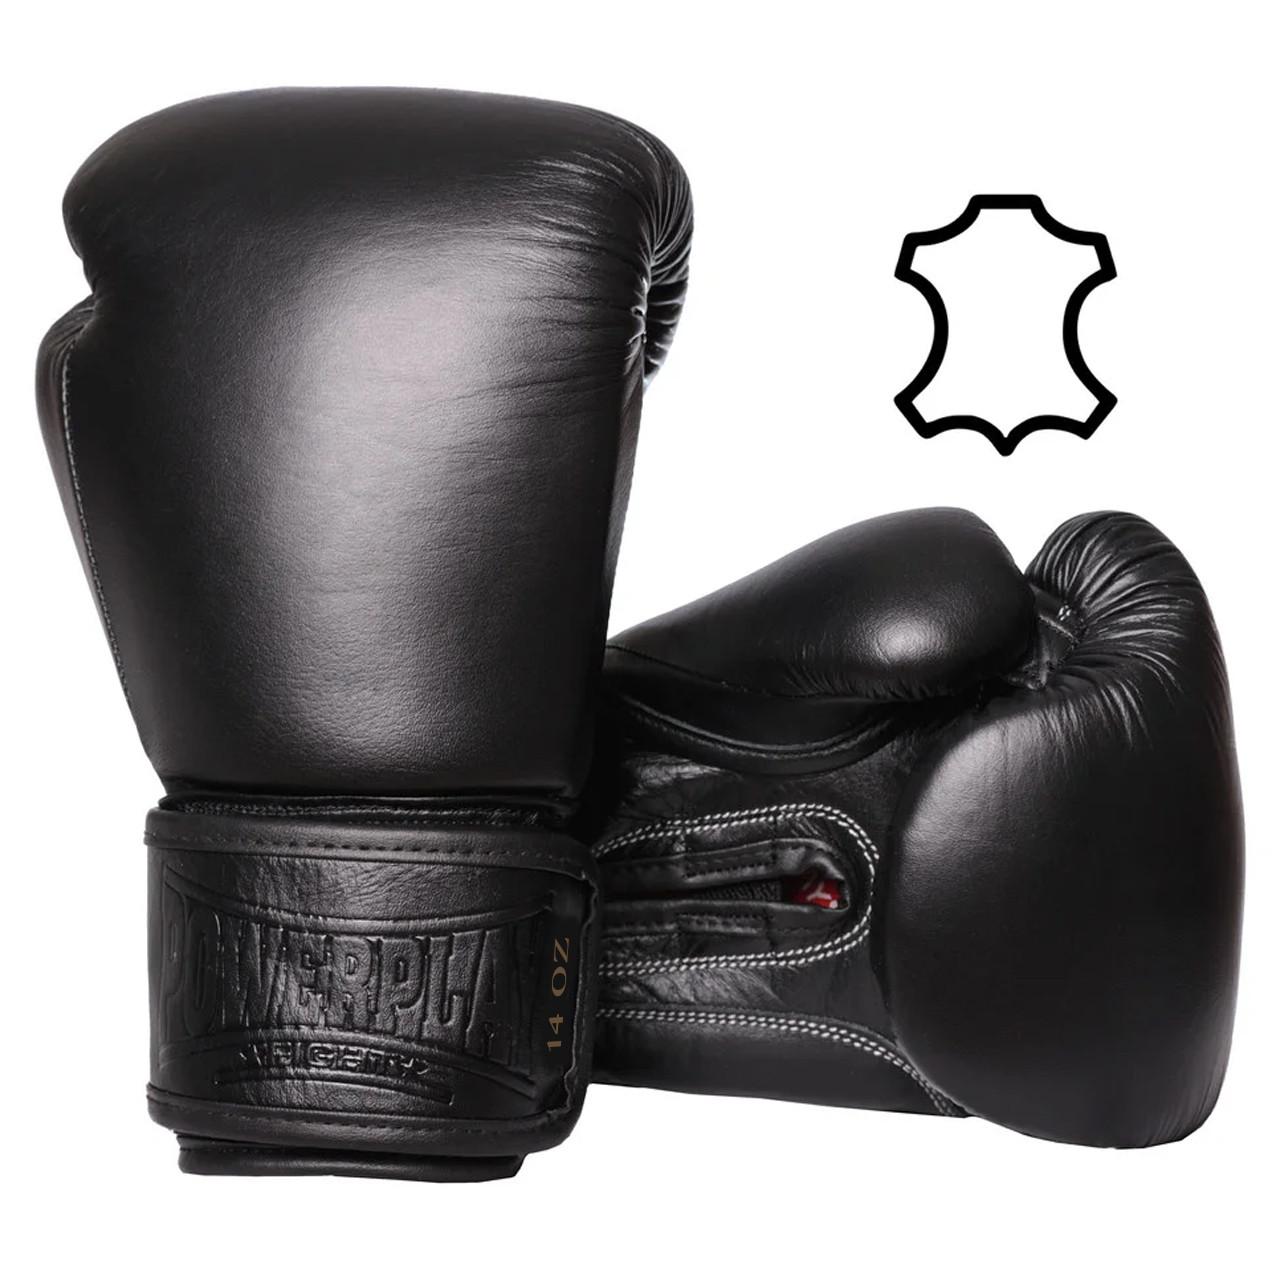 Боксерські рукавиці PowerPlay 3014 Чорні [натуральна шкіра] 14 унцій